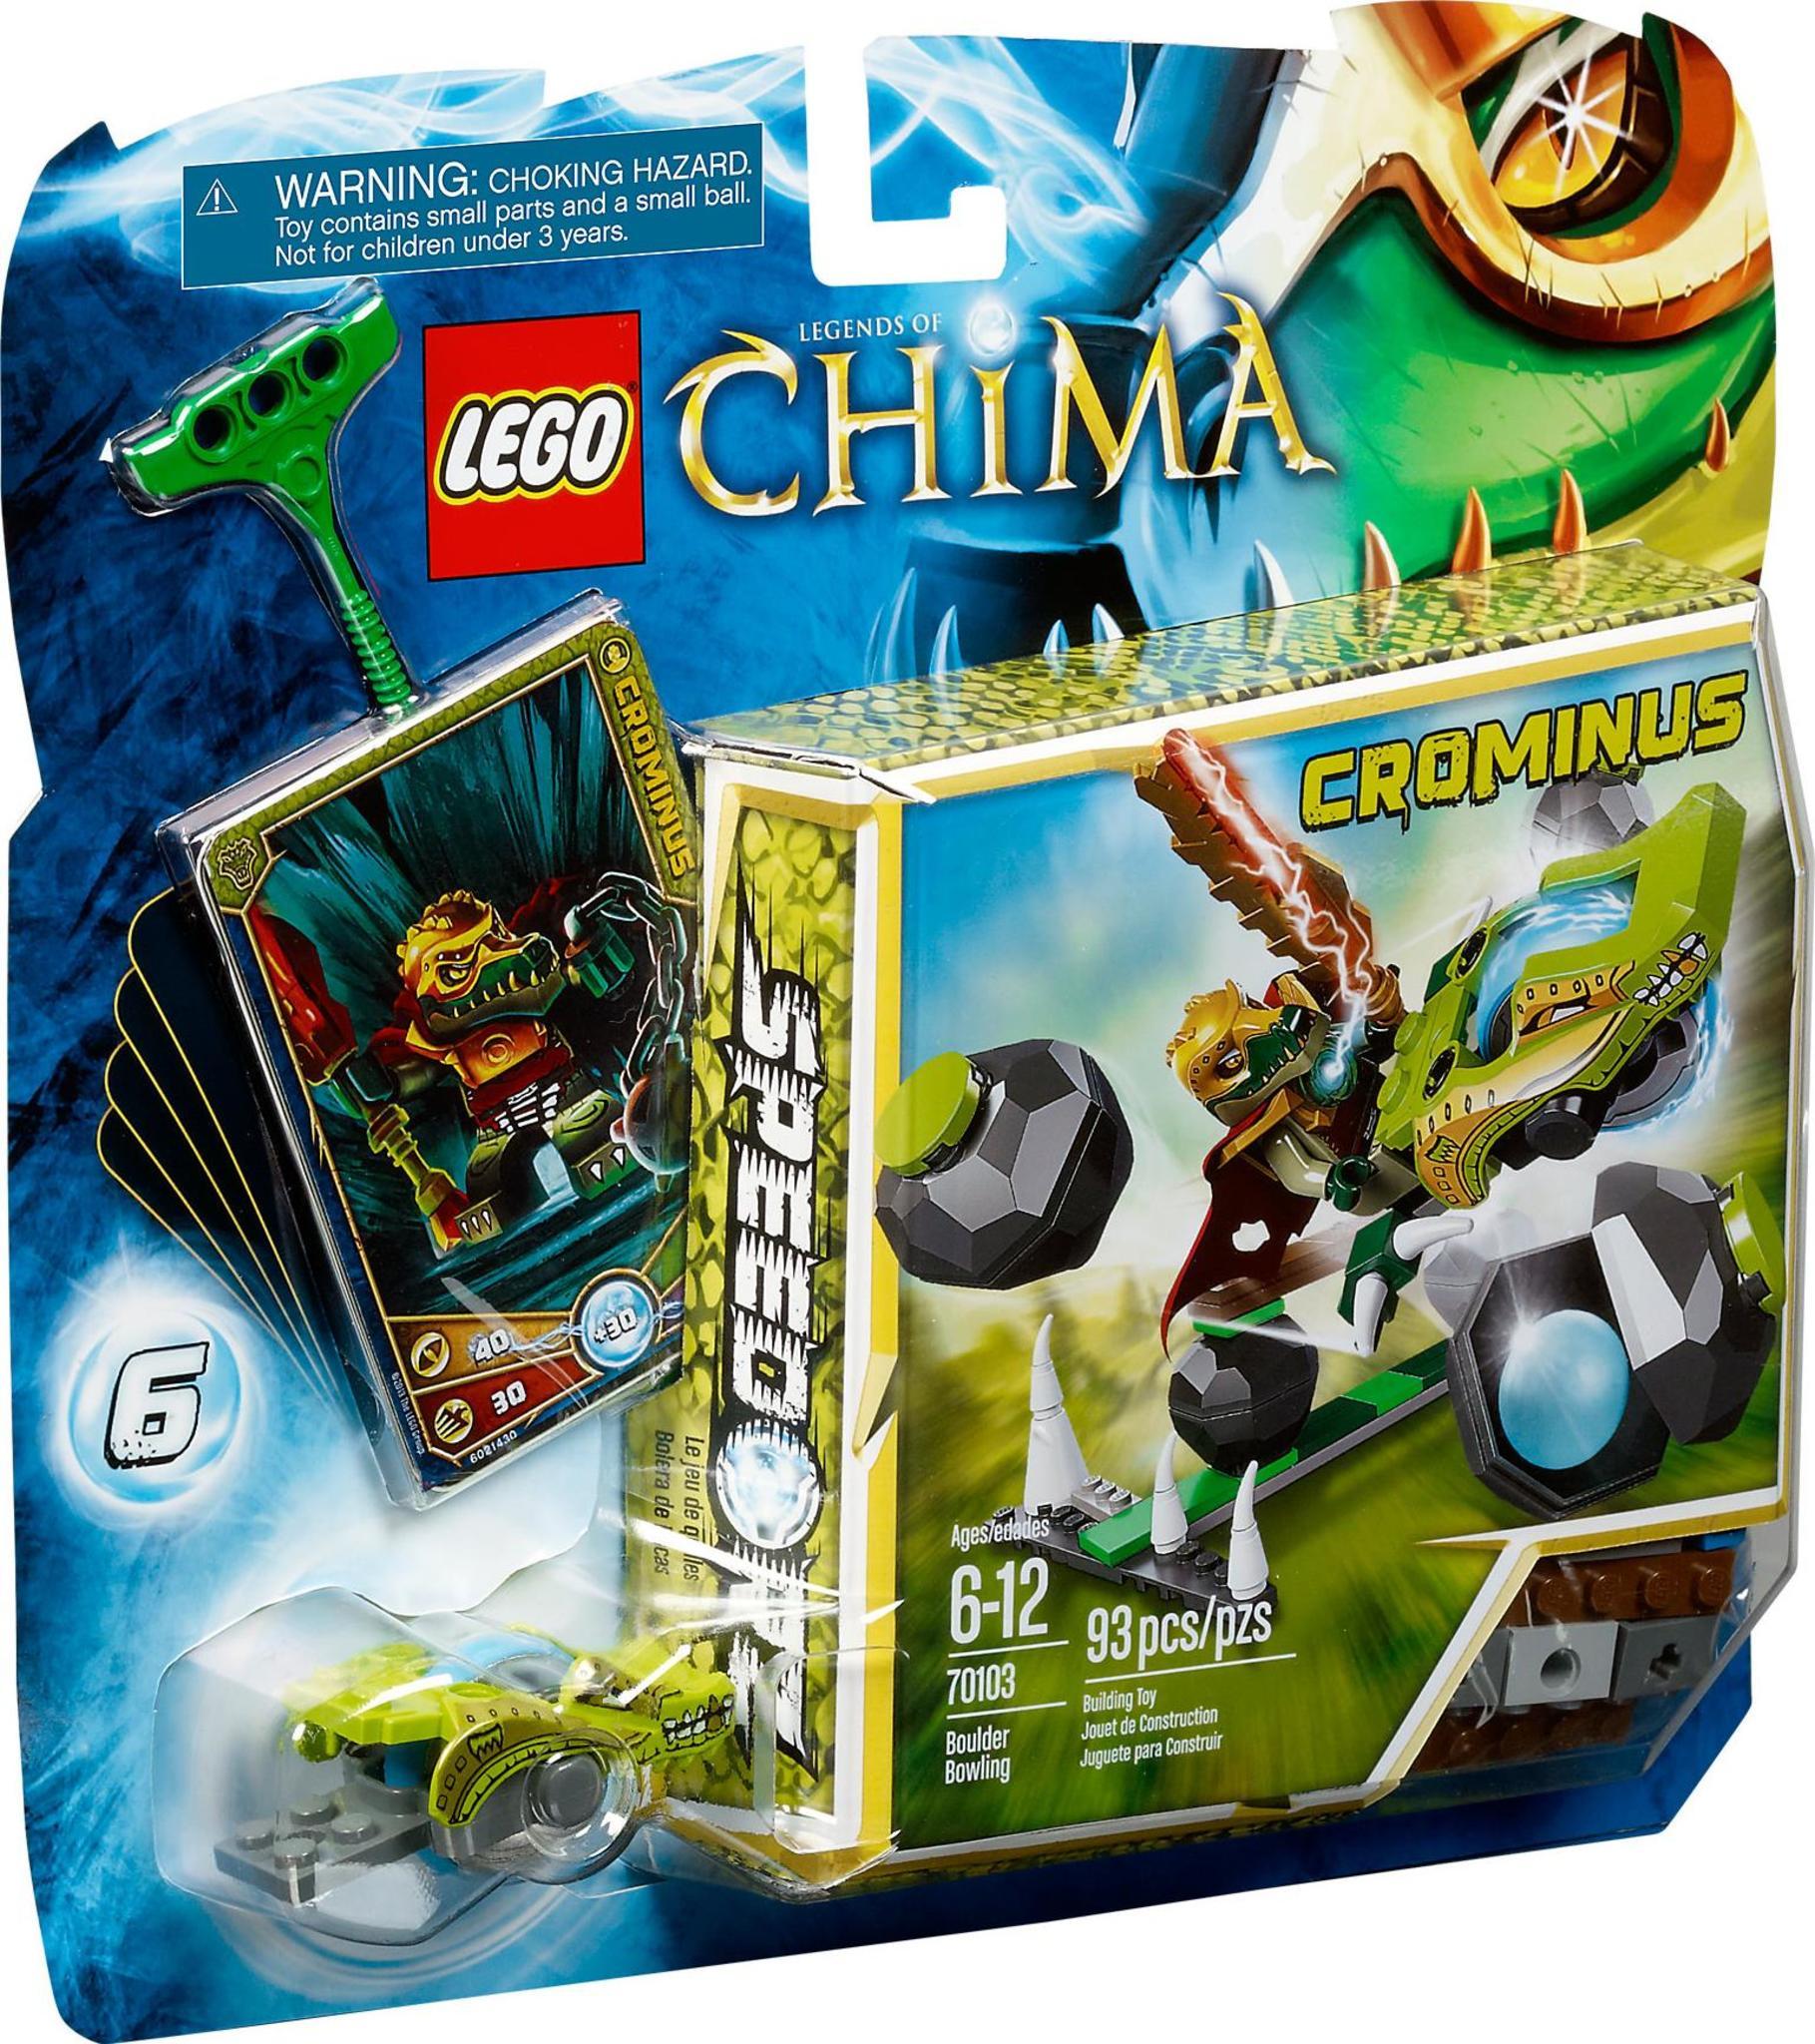 A1301470 Lego 70103 Chima Tout Chamboule EDHW2Ib9eY